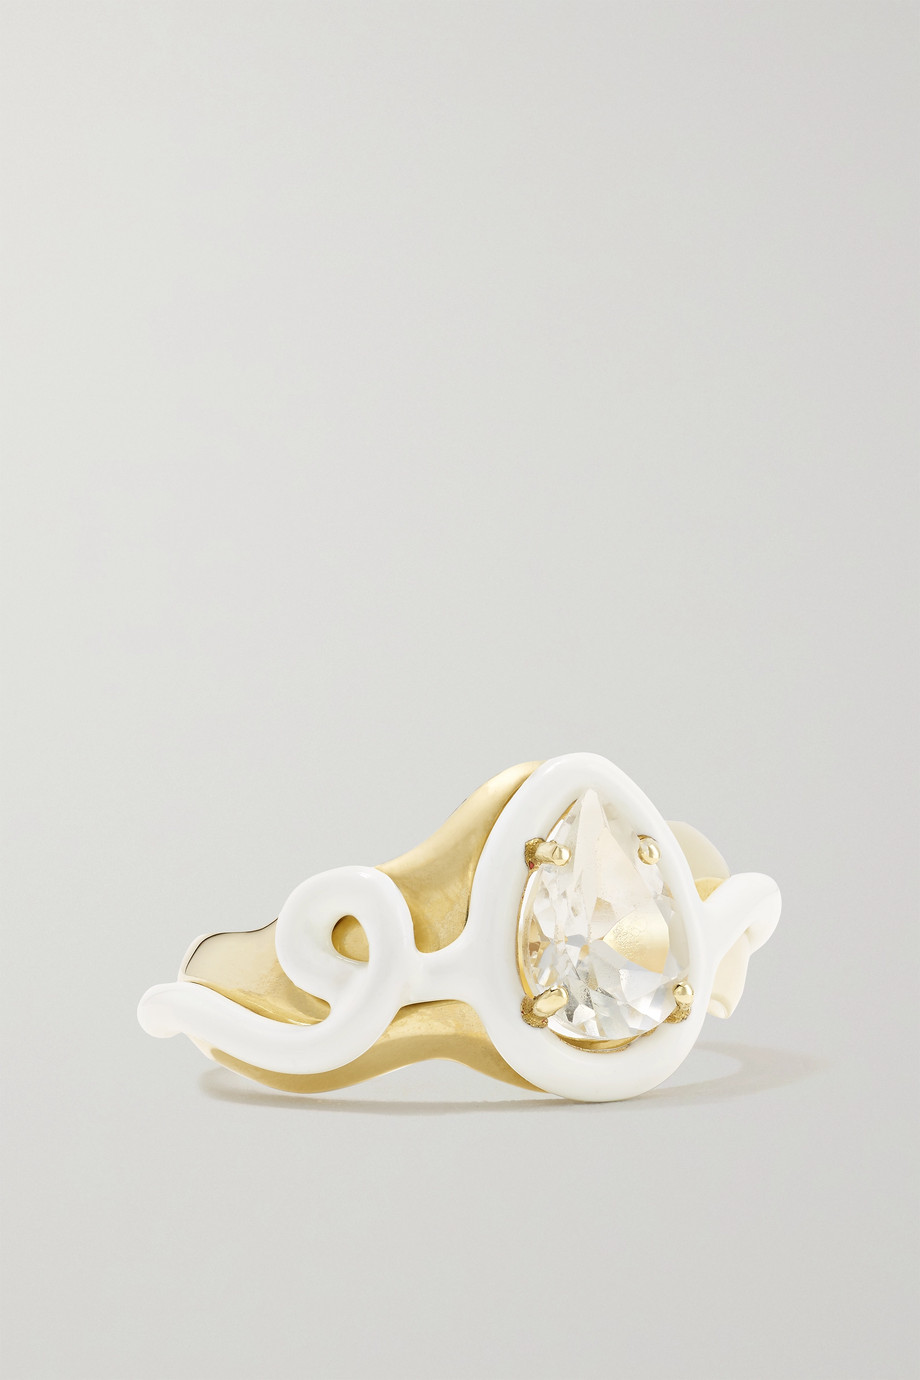 Bea Bongiasca Bague en or 9 carats (375/1000), émail et cristal de roche Totally Awesome Squiggle